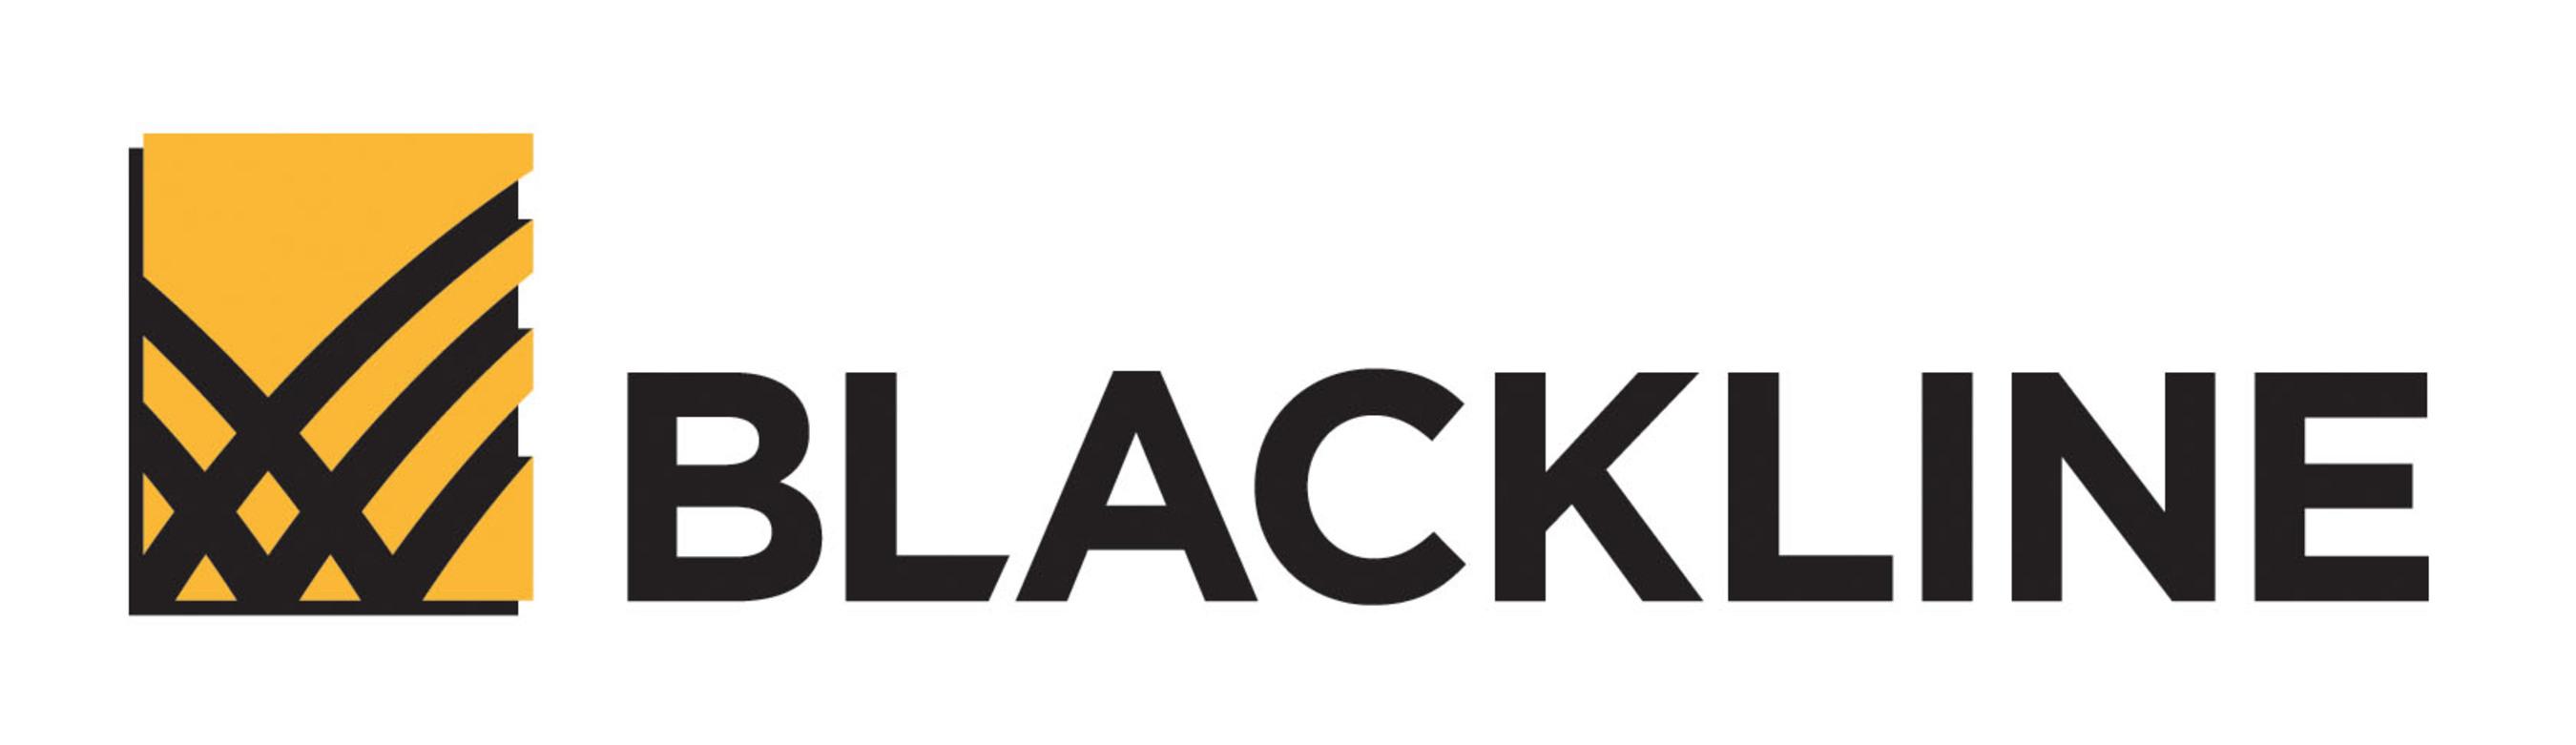 BlackLine company logo.